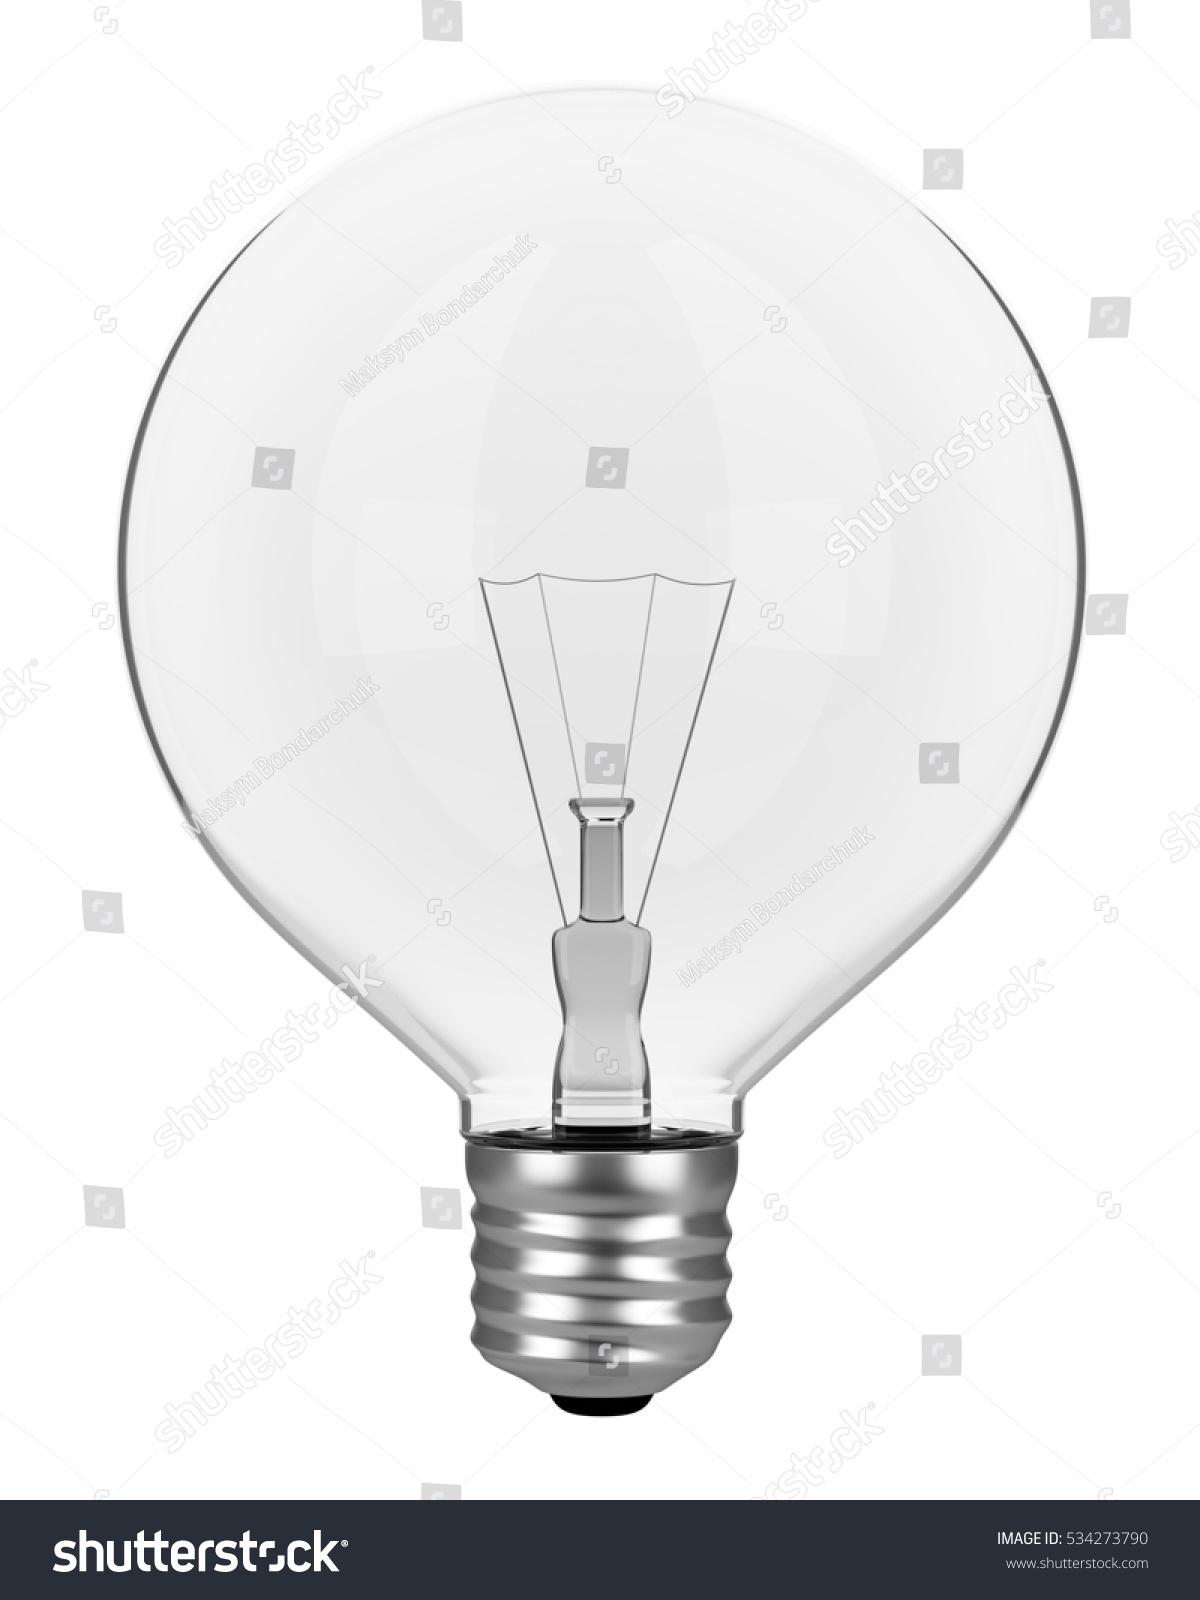 Light Bulb Isolated On White Background Stock Illustration 534273790 ...